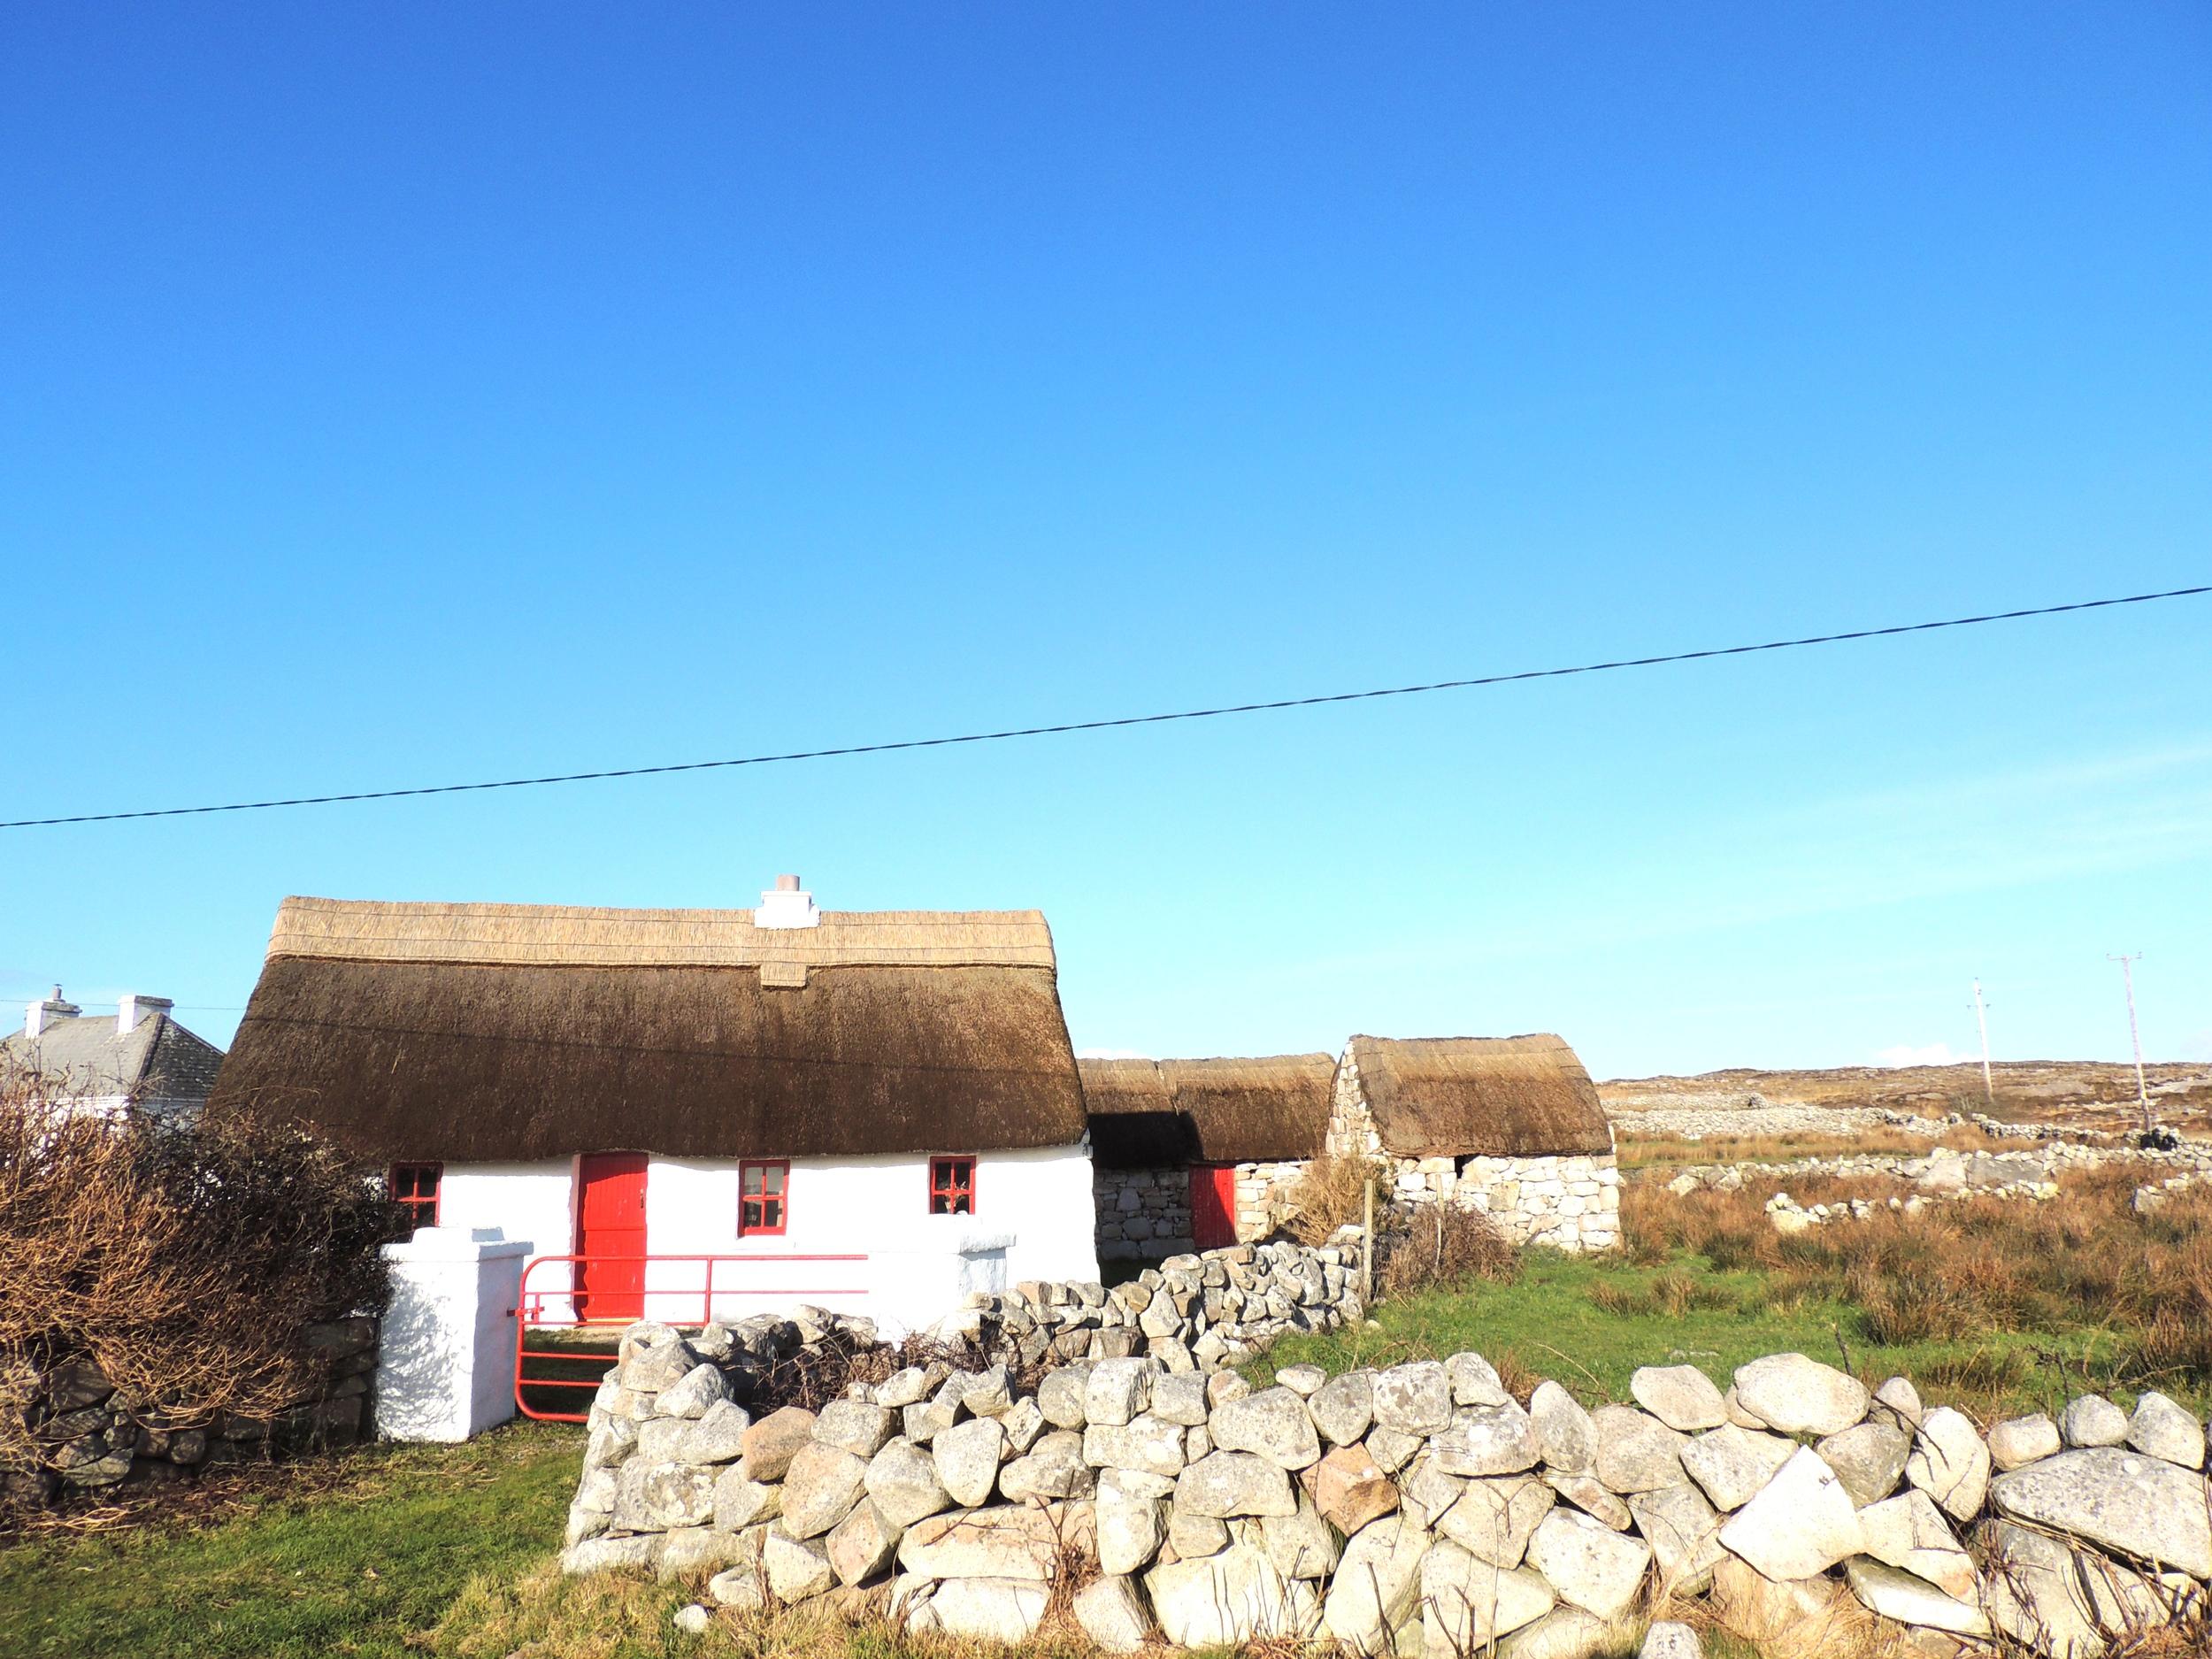 Mungo's Cottage